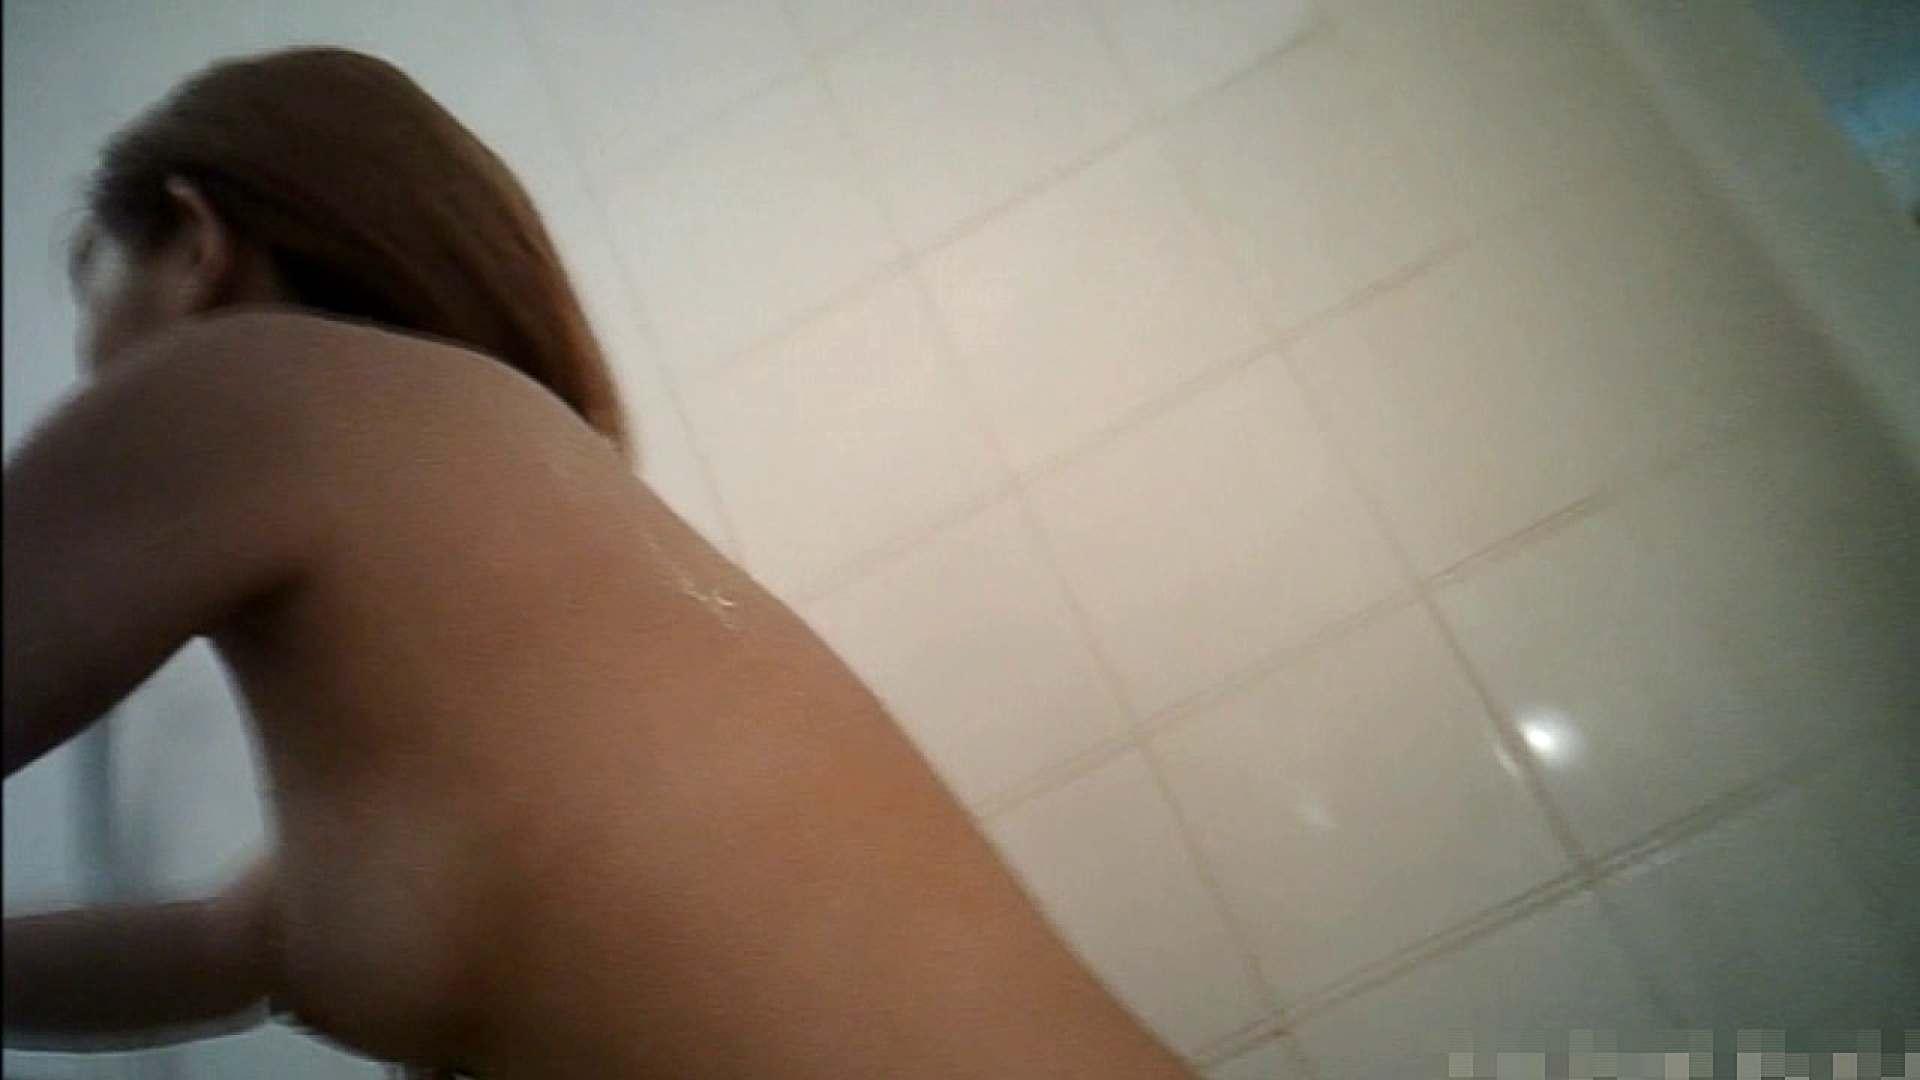 vol.7 【Mちゃん(入浴)】ブランド品査定士19歳 巨乳ギャル キャバ嬢の実態 エロ無料画像 81pic 54